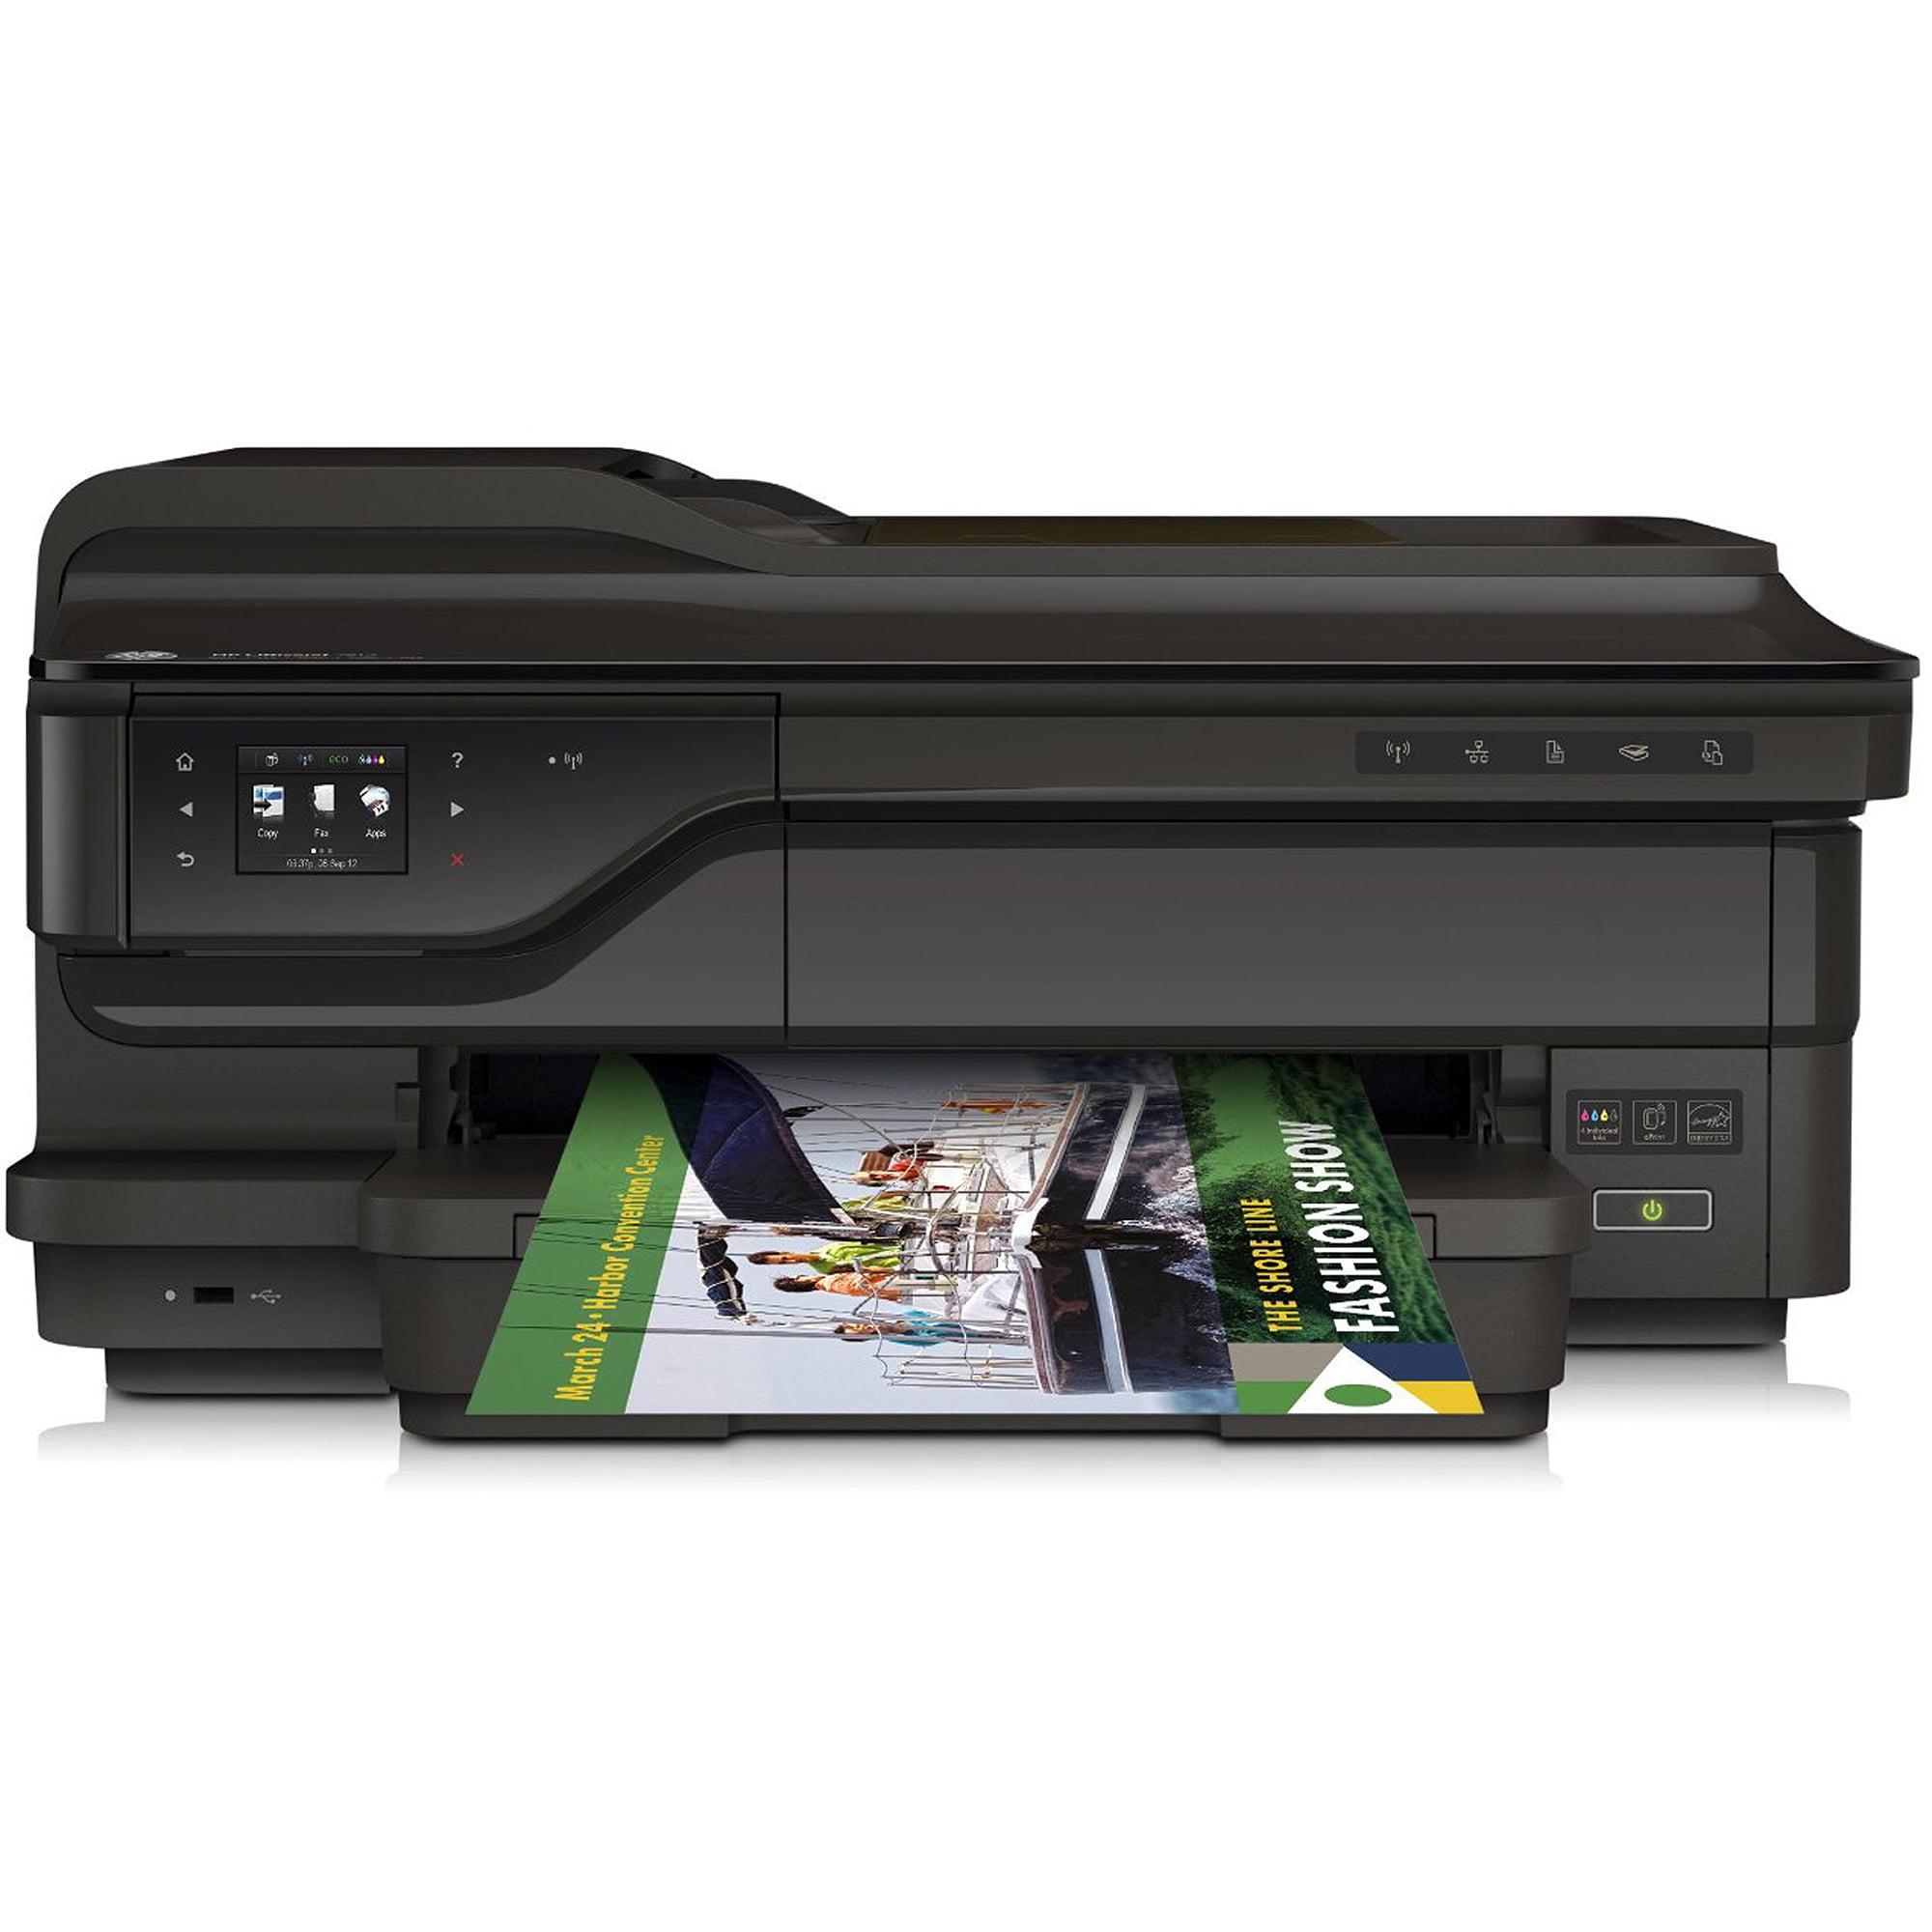 HP CX185A#B1H Officejet 7612 Wide Format e-All-in-One Printer/Copier/Scanner/Fax Machine